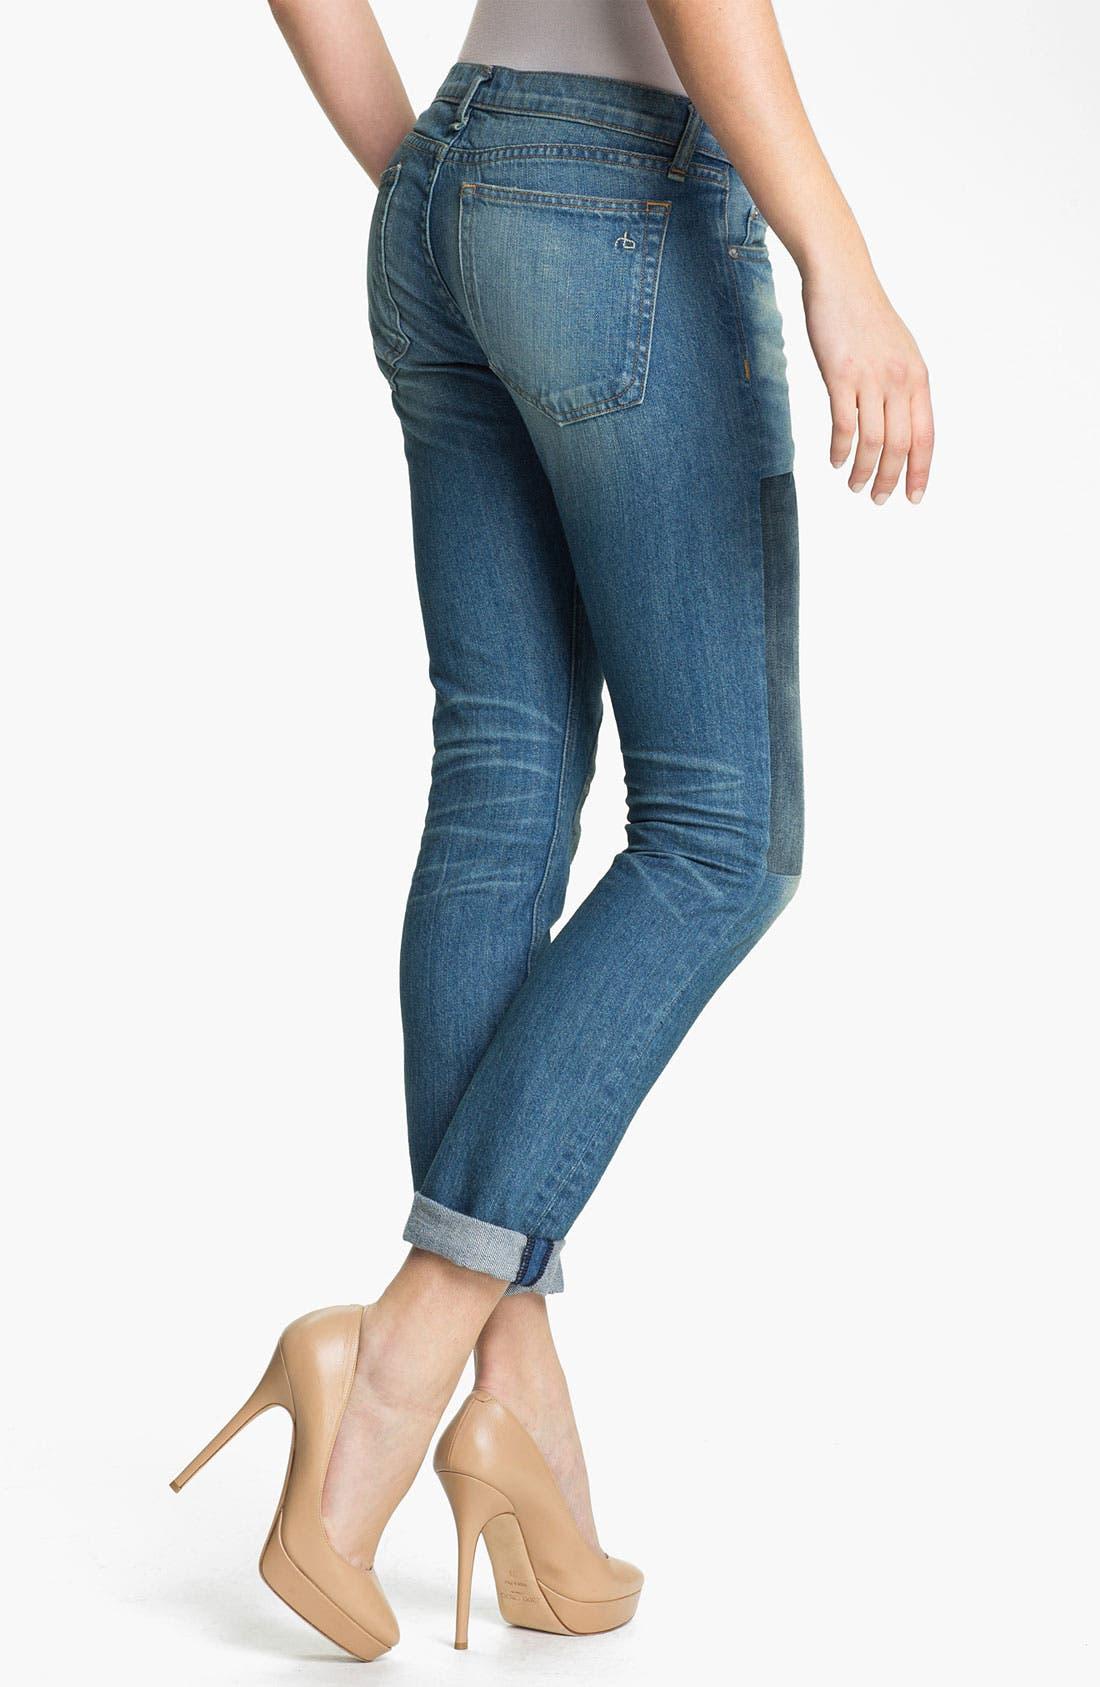 Alternate Image 2  - rag & bone/JEAN 'The Dre' Patch Detail Rigid Jeans